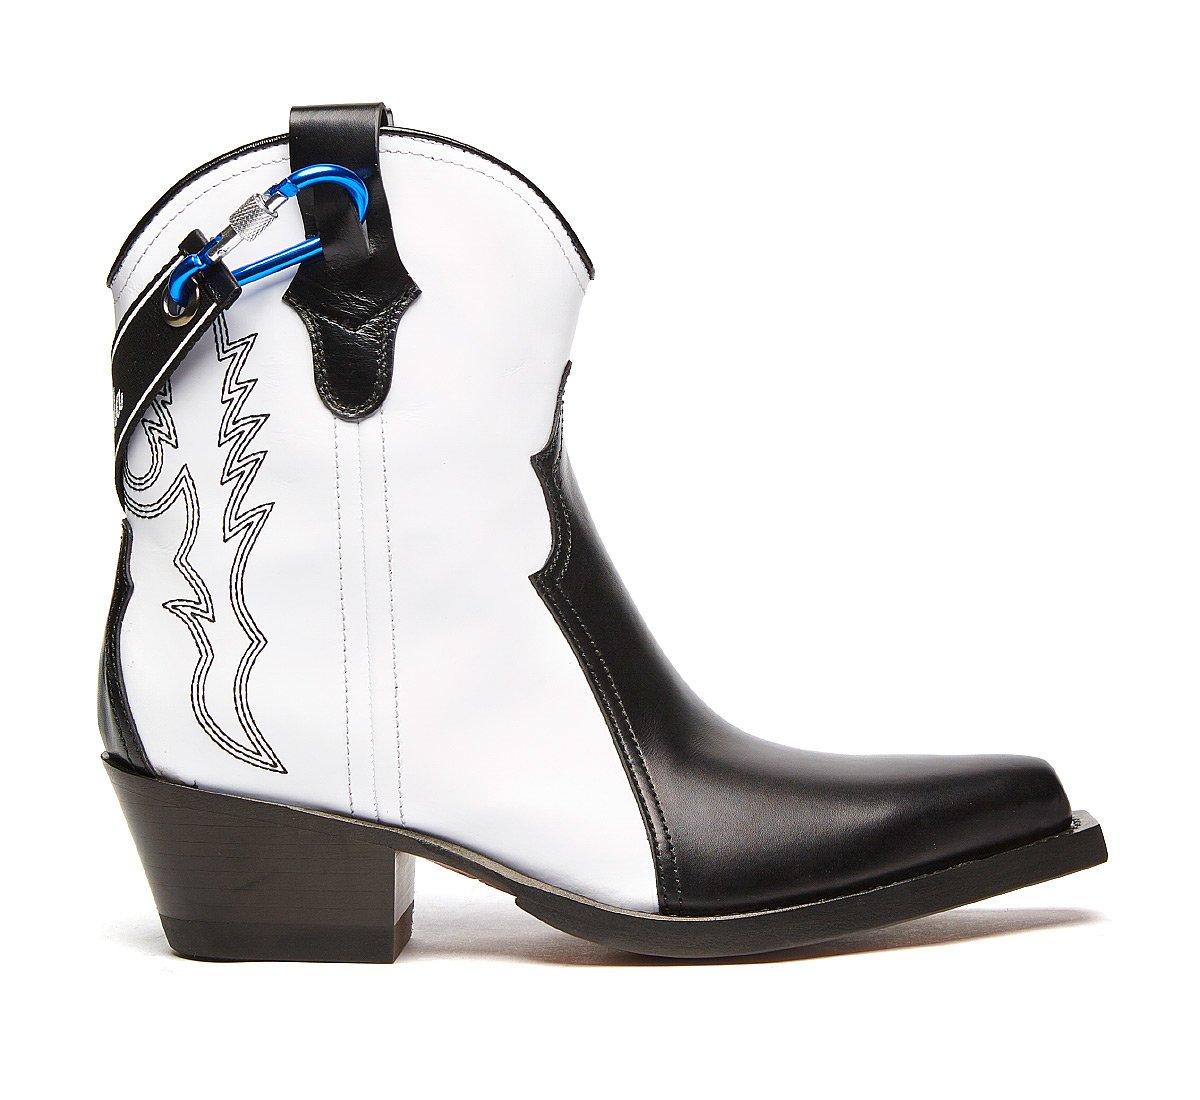 Barracuda Texan boots in luxury calf leather